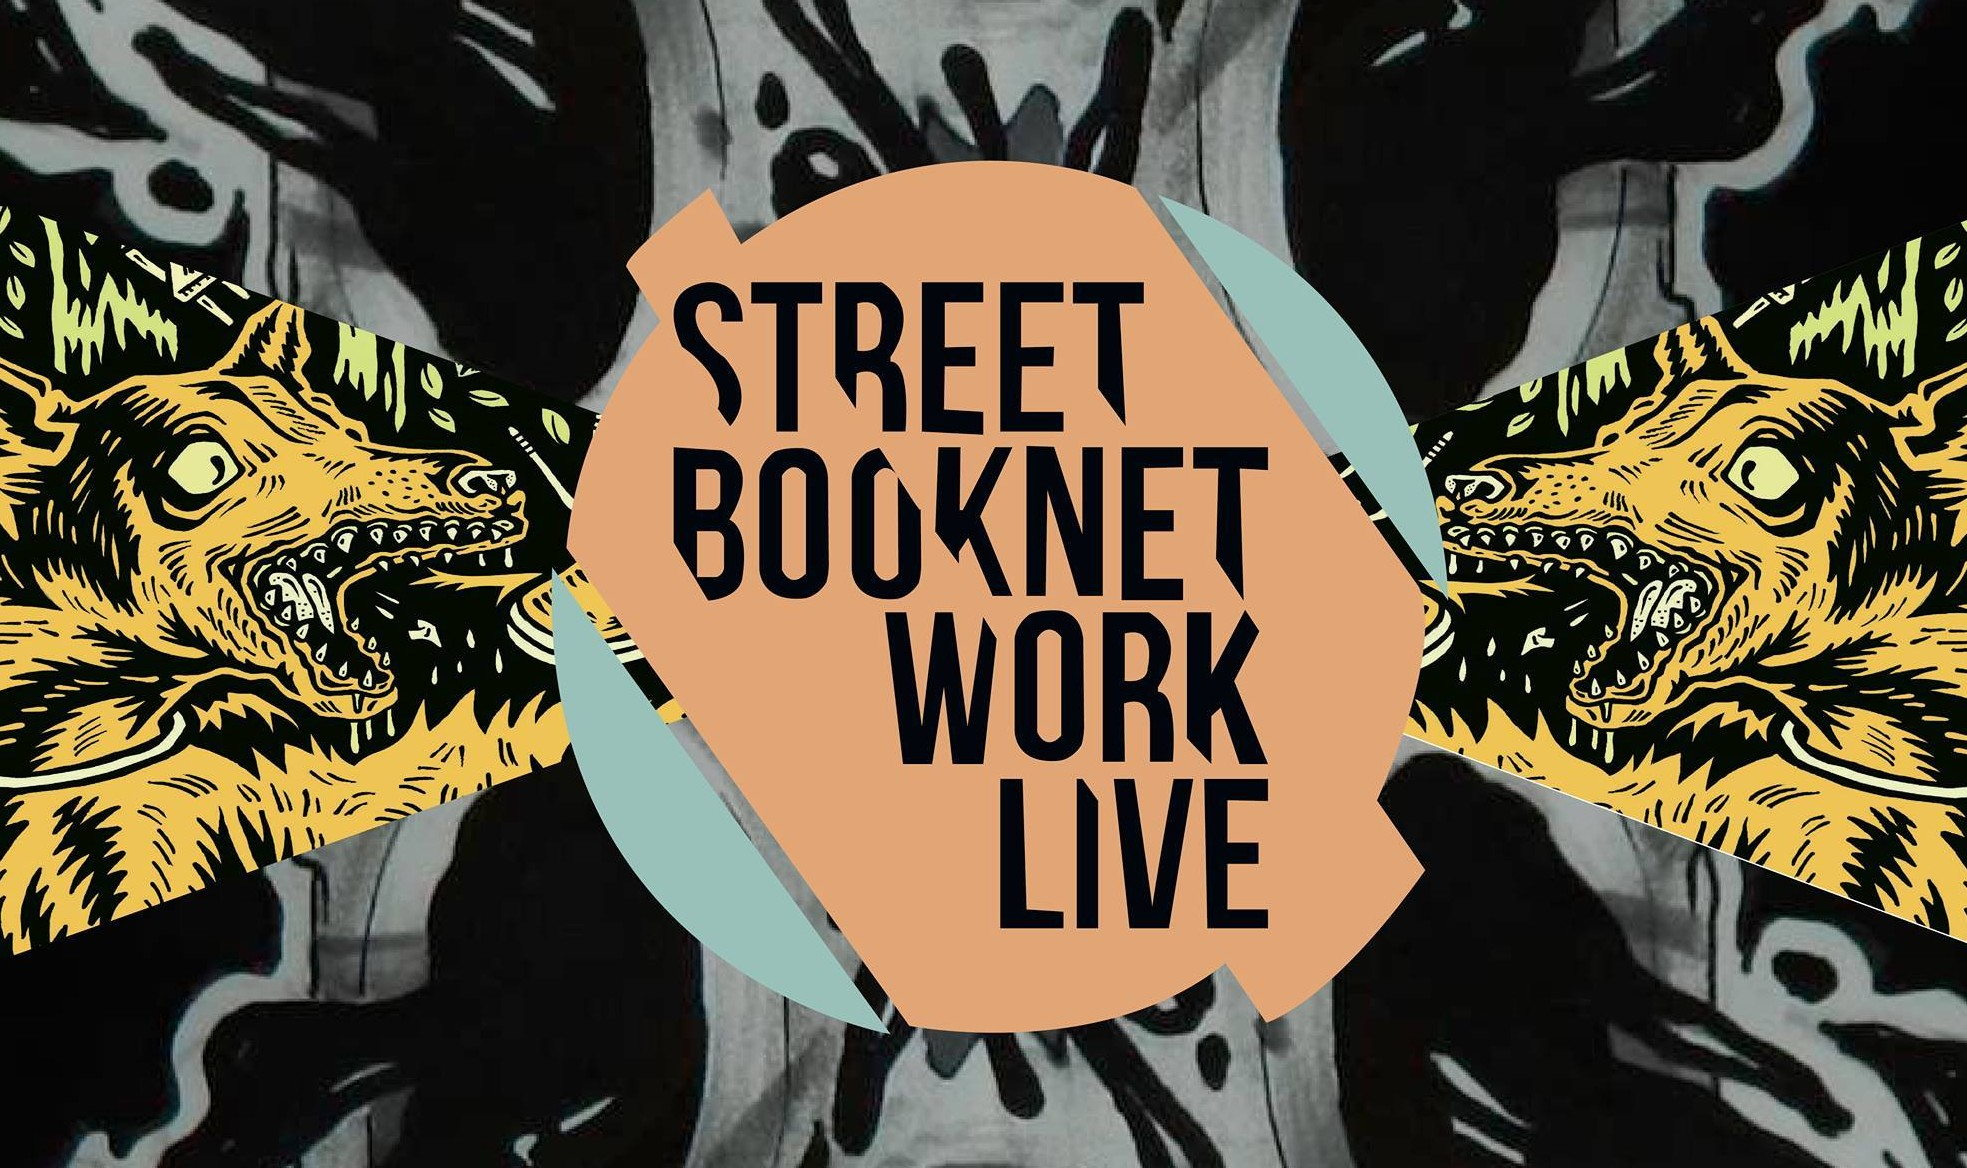 StreetBook Network Live || 17 dicembre 2016 @ Multiverso (FI)